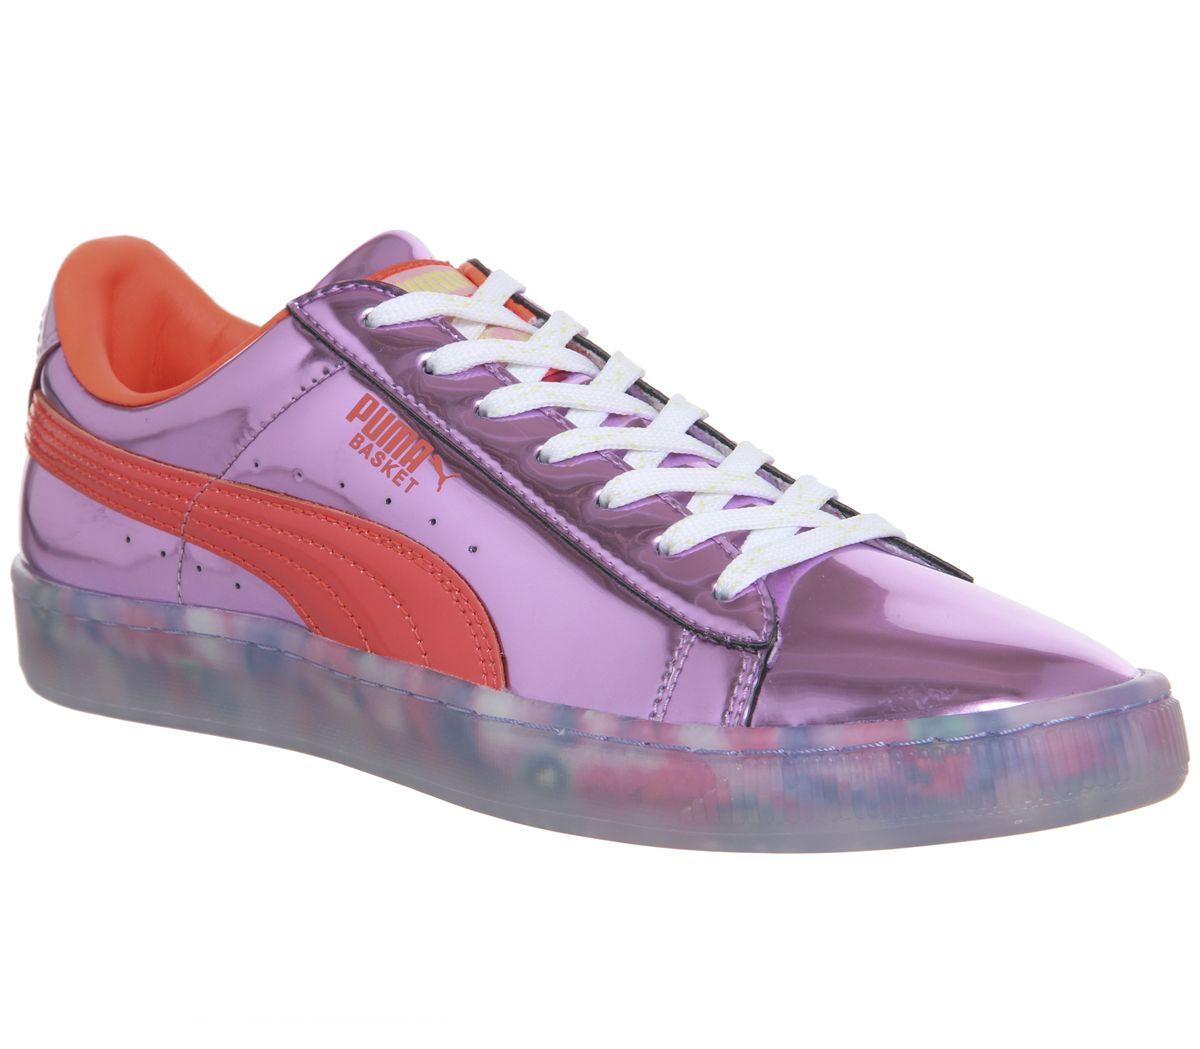 lowest price 5d7d2 169b6 Puma Basket Candy Princess Trainers Sw Metallic Pink Firey ...